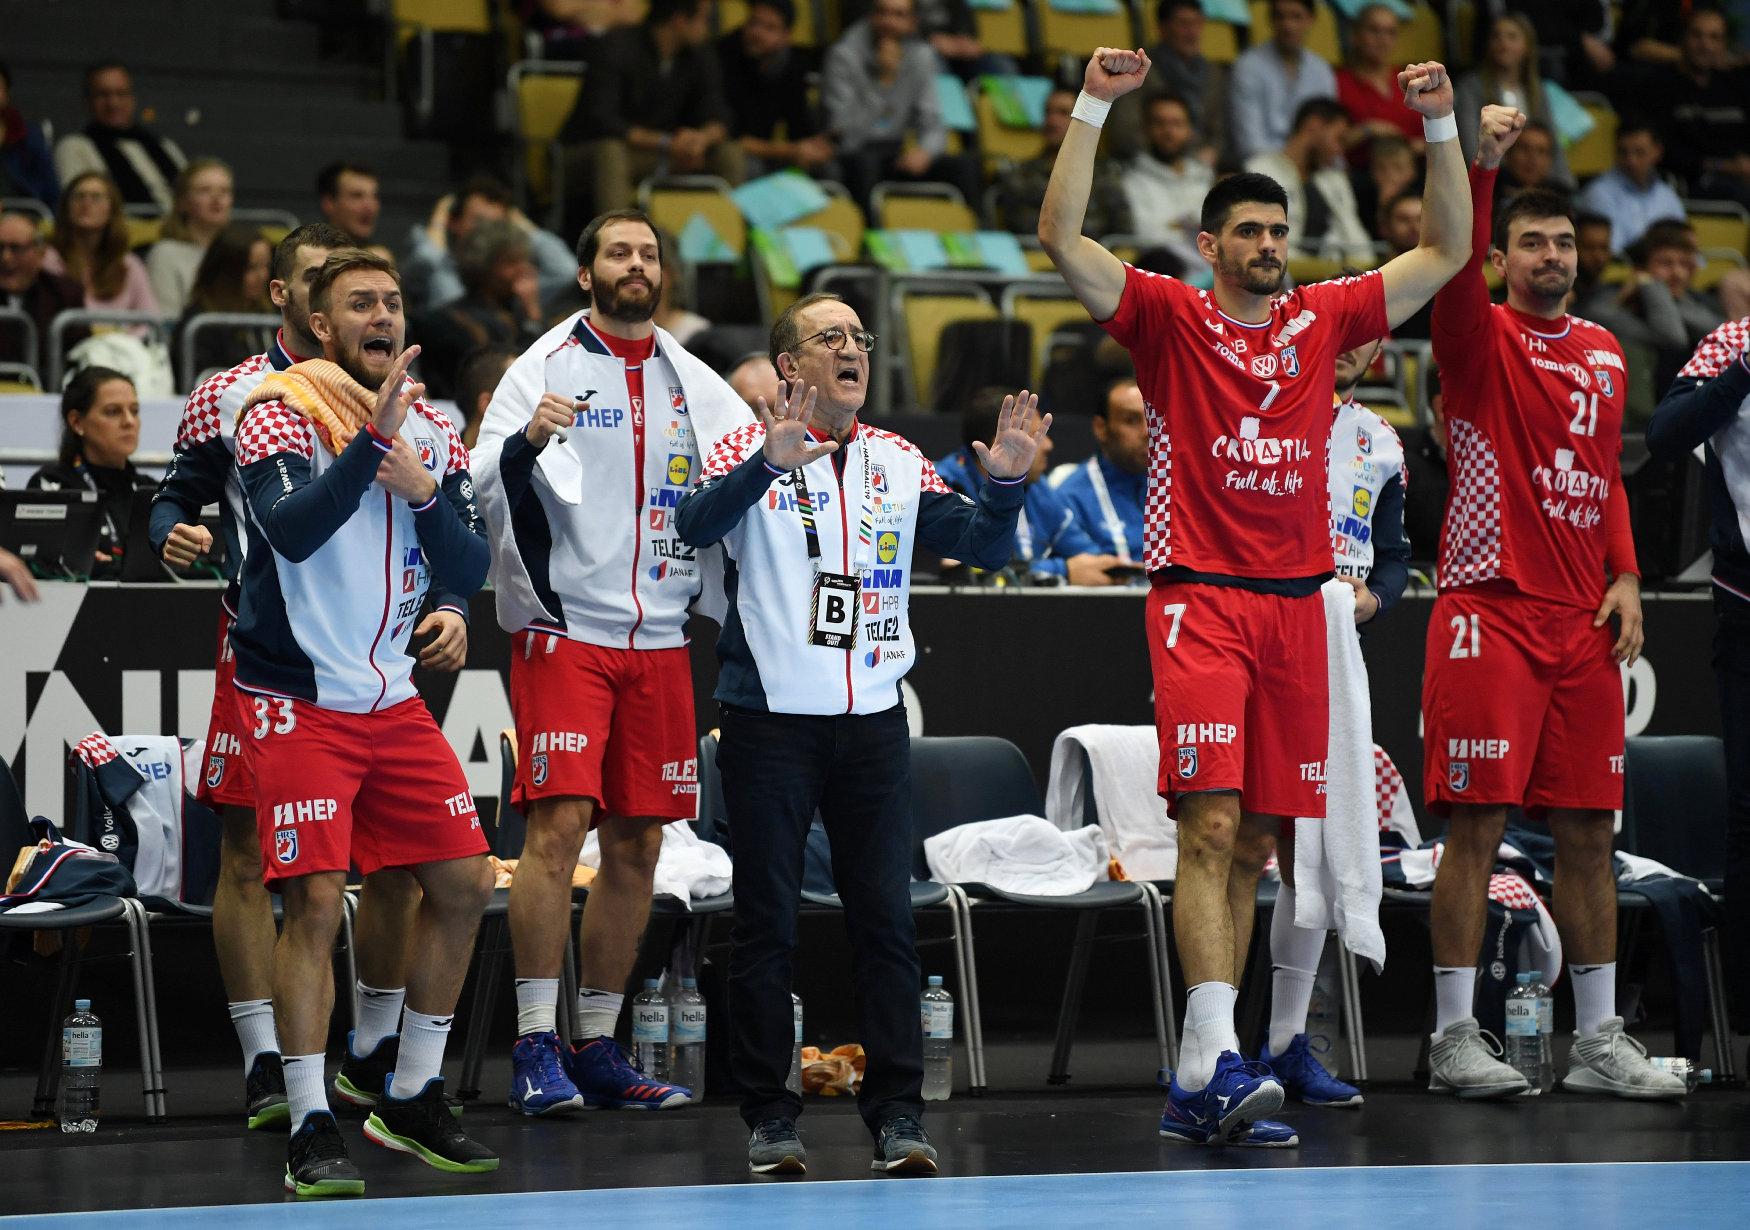 IHF Handball World Championship - Germany & Denmark 2019 - Group B - Croatia v Macedonia - Olympiahalle, Munich, Germany - January 14, 2019  Croatia caoch Lino Cervar during the match   REUTERS/Andreas Gebert